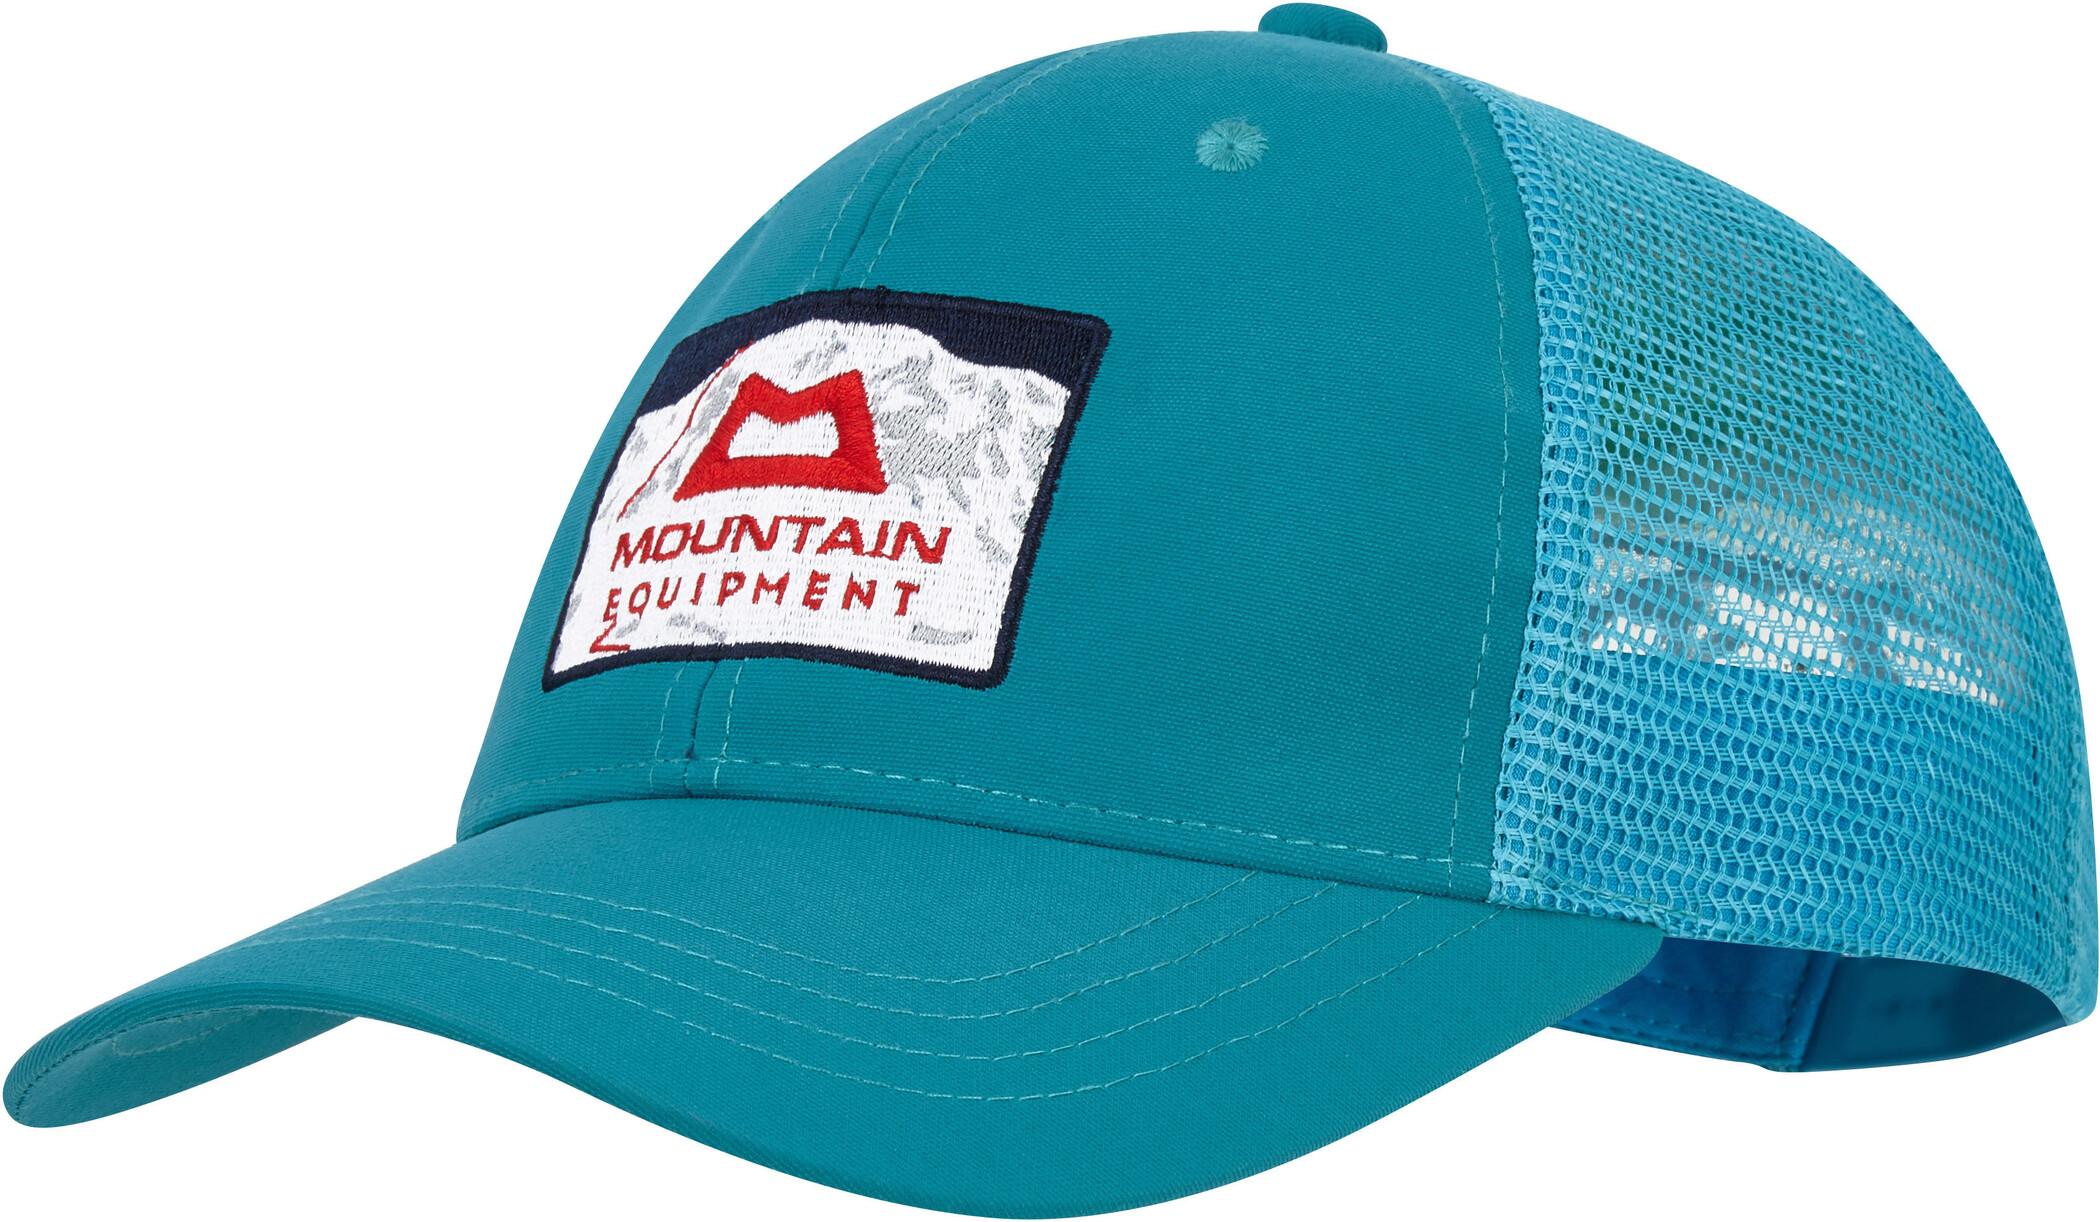 reputable site 1ffe9 39788 Mountain Equipment Yosemite Cap Tasman Blue.jpg